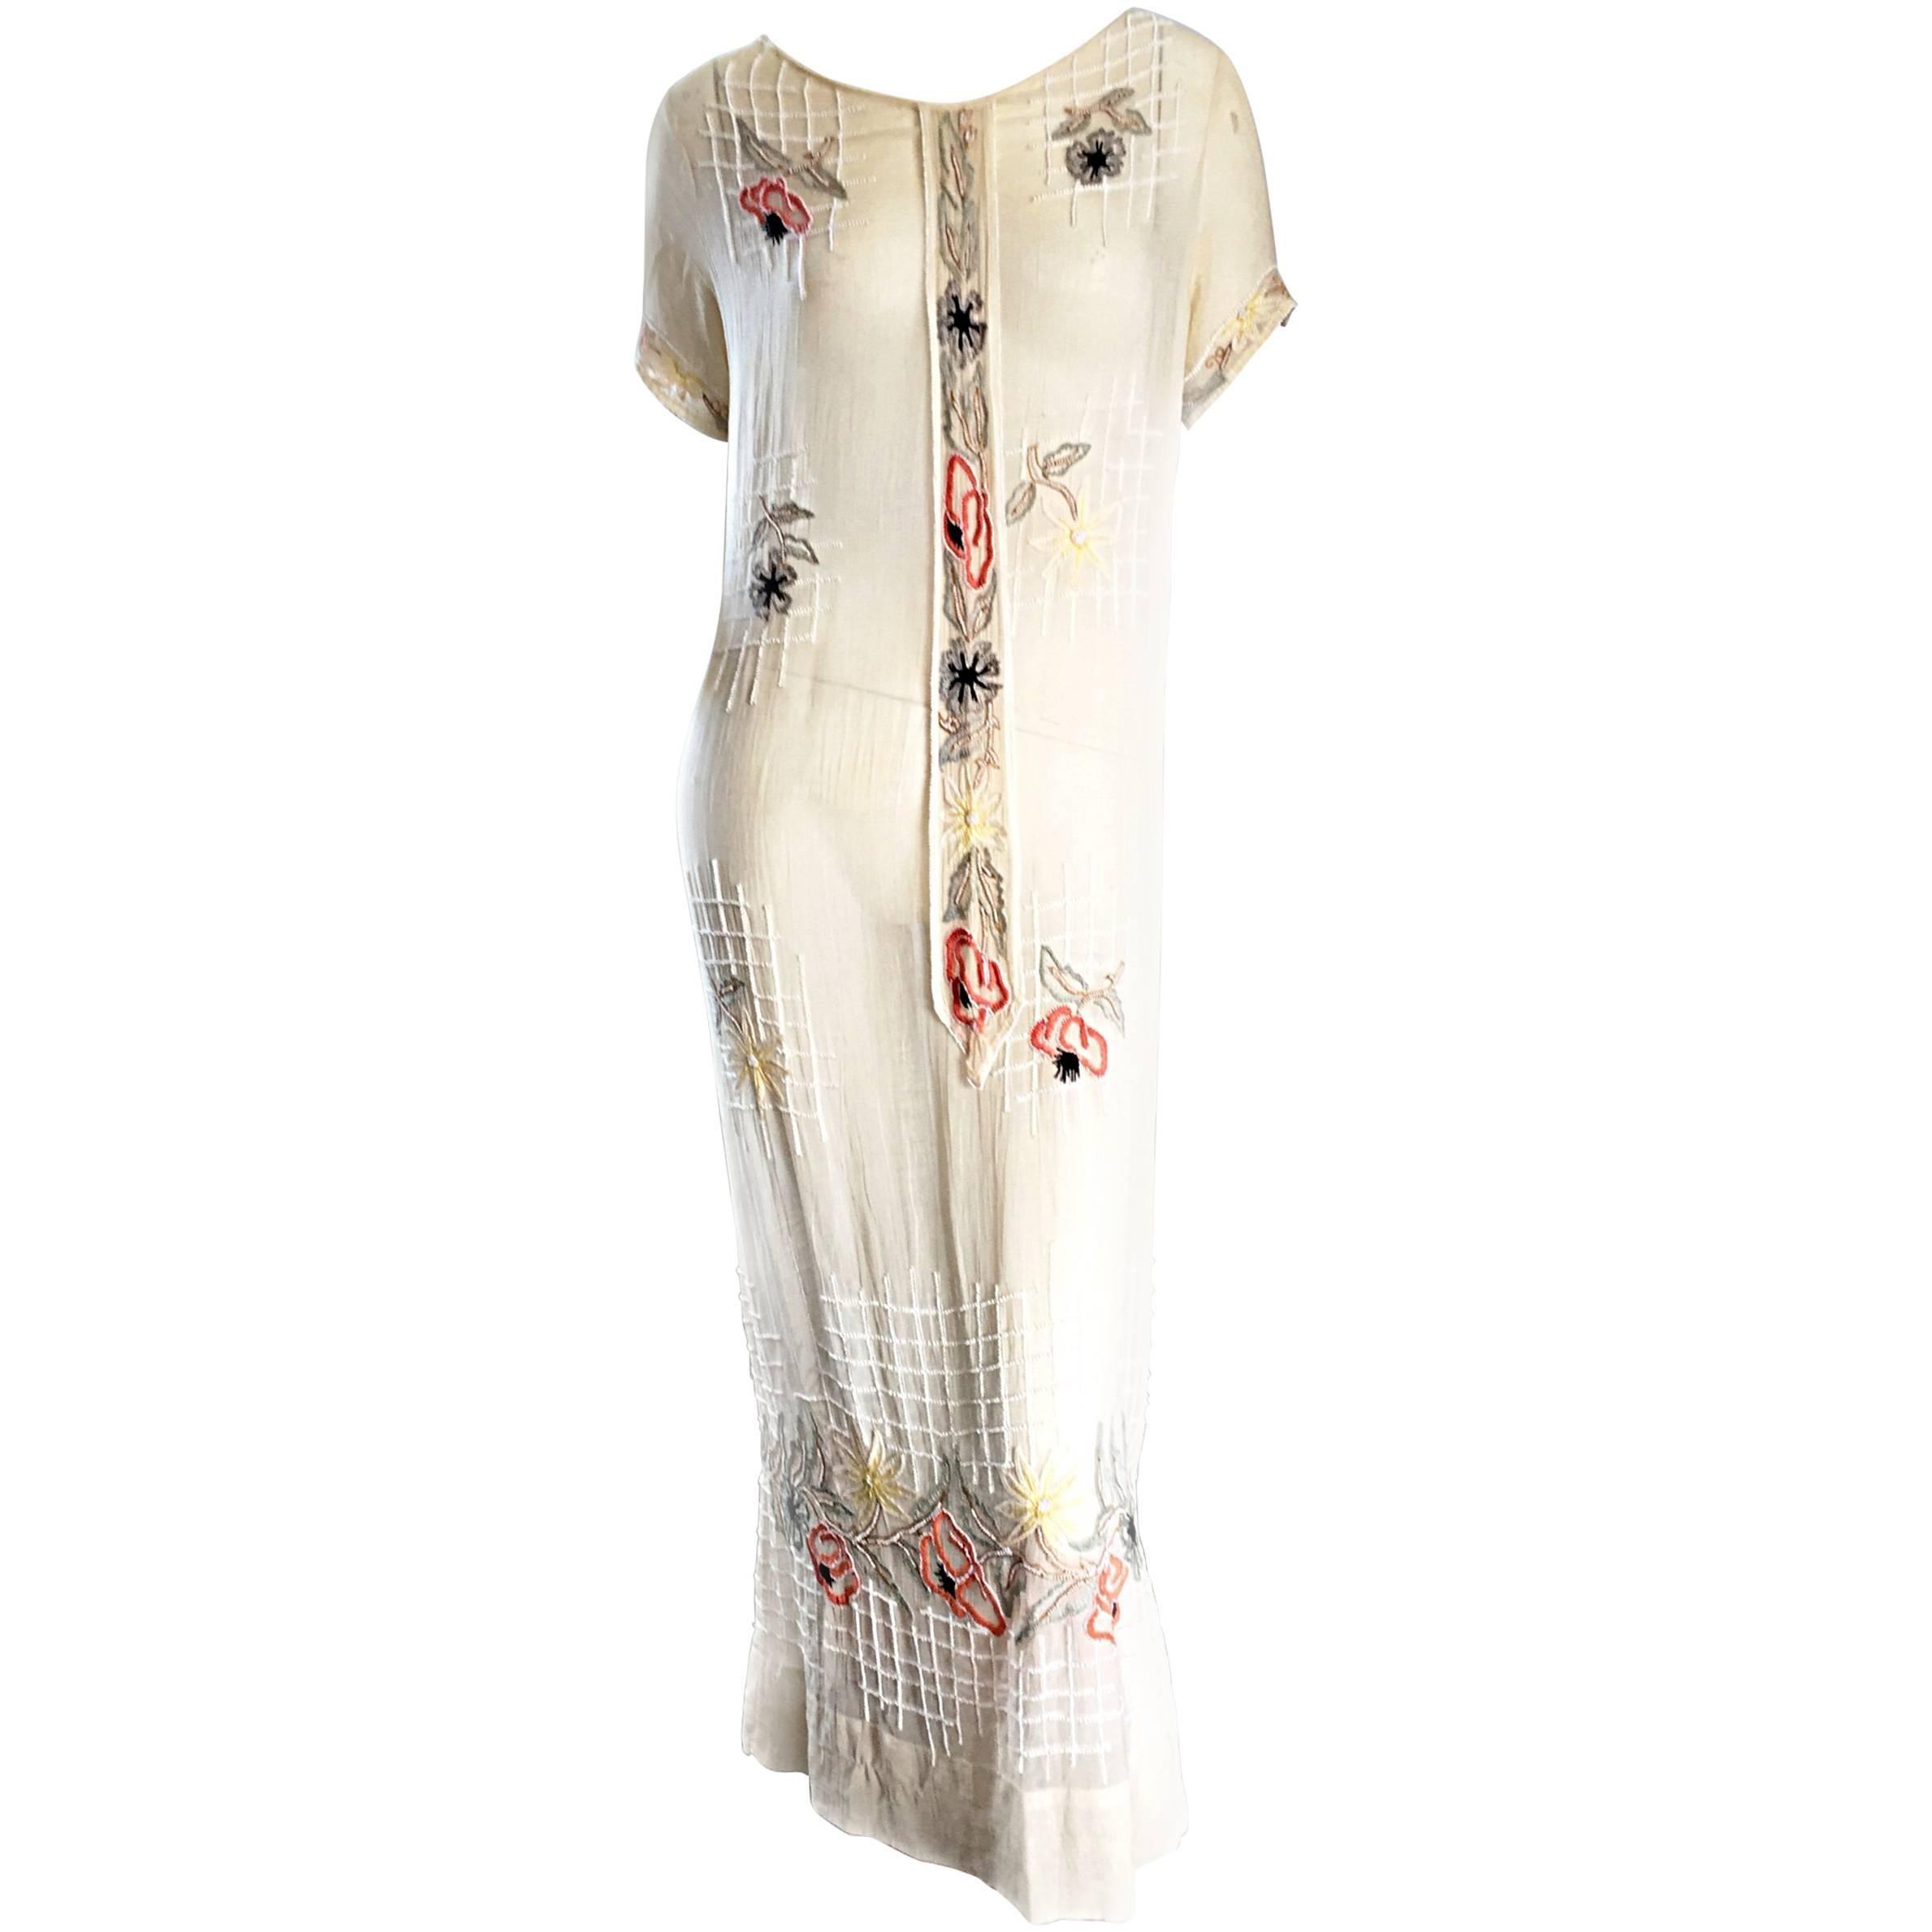 Rare 1920s B Altman Haute Couture Ivory Hand Beaded Cotton Voile Vintage Dress